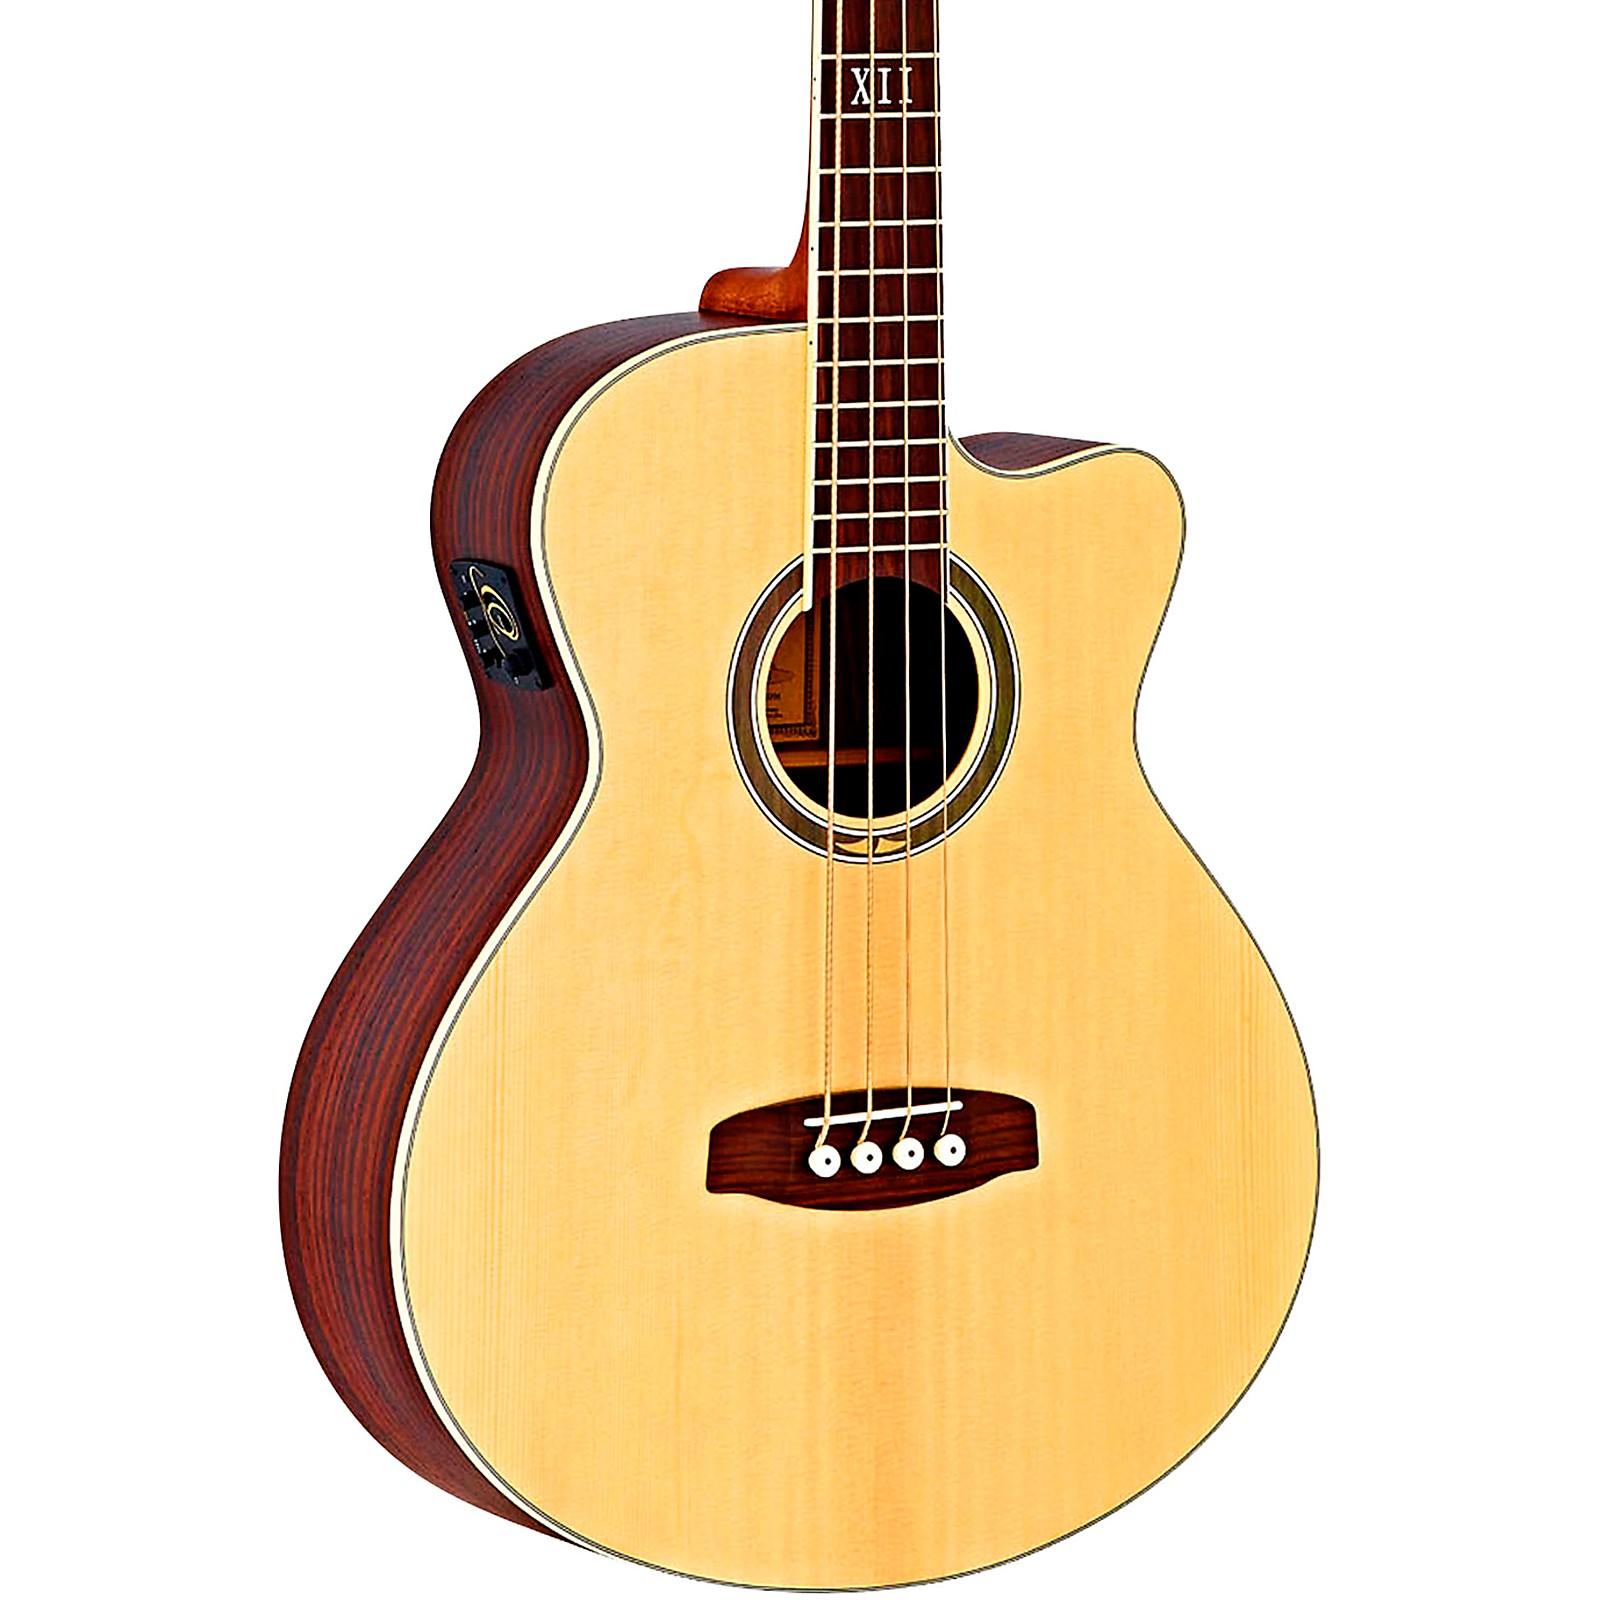 Ortega Deep Series 5 D558-4 Walnut Acoustic-Electric Bass